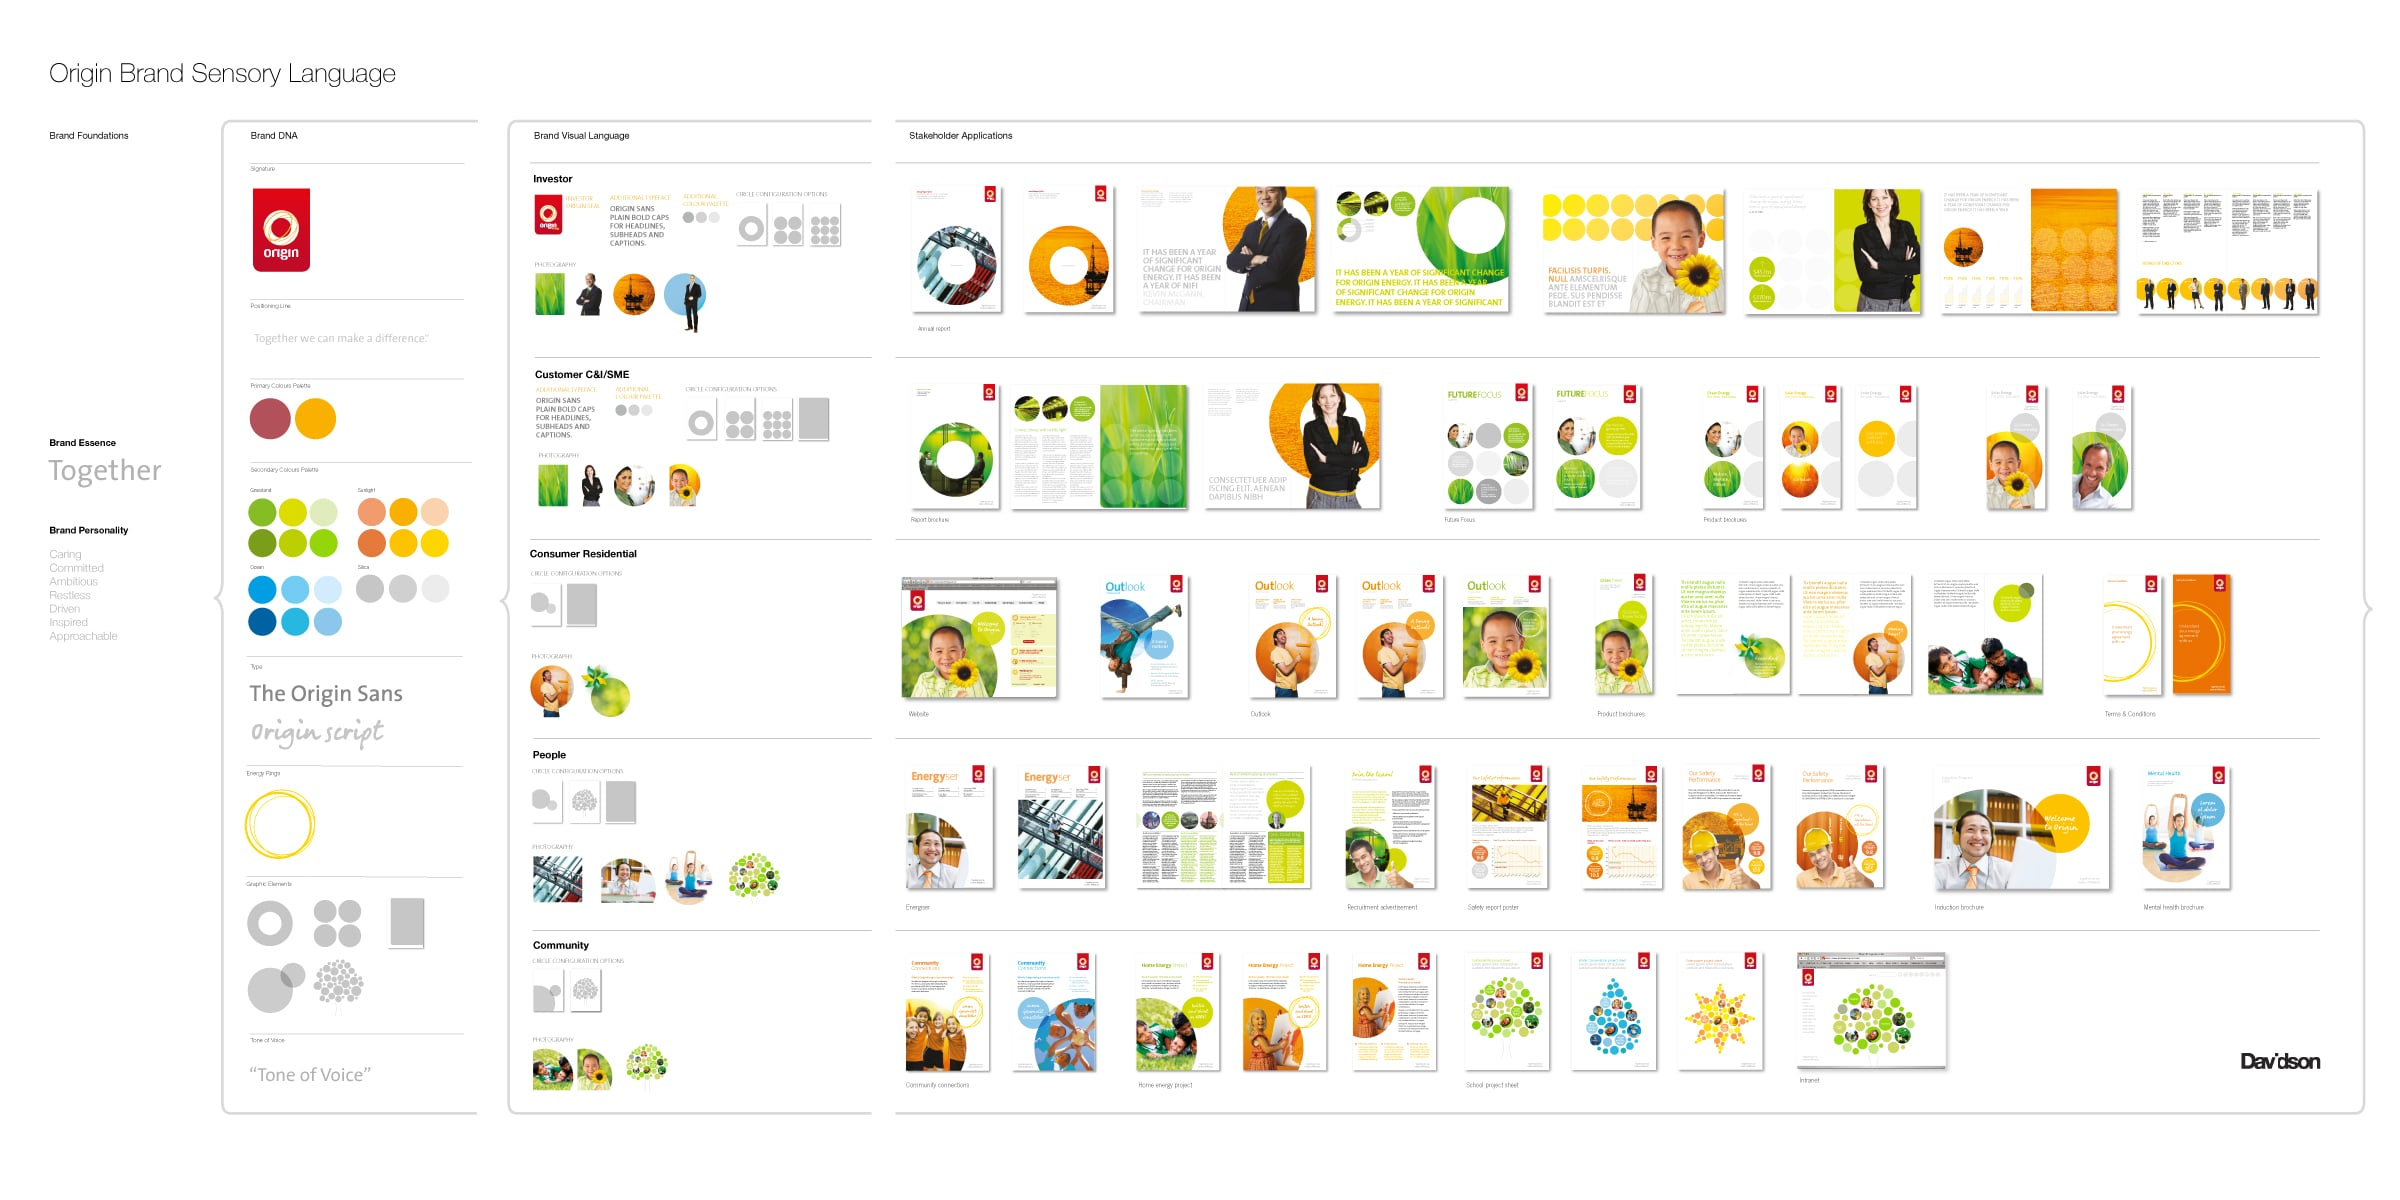 Davidson Branding Corporate Origin Energy Brand Strategy Brand Identity Visual Language